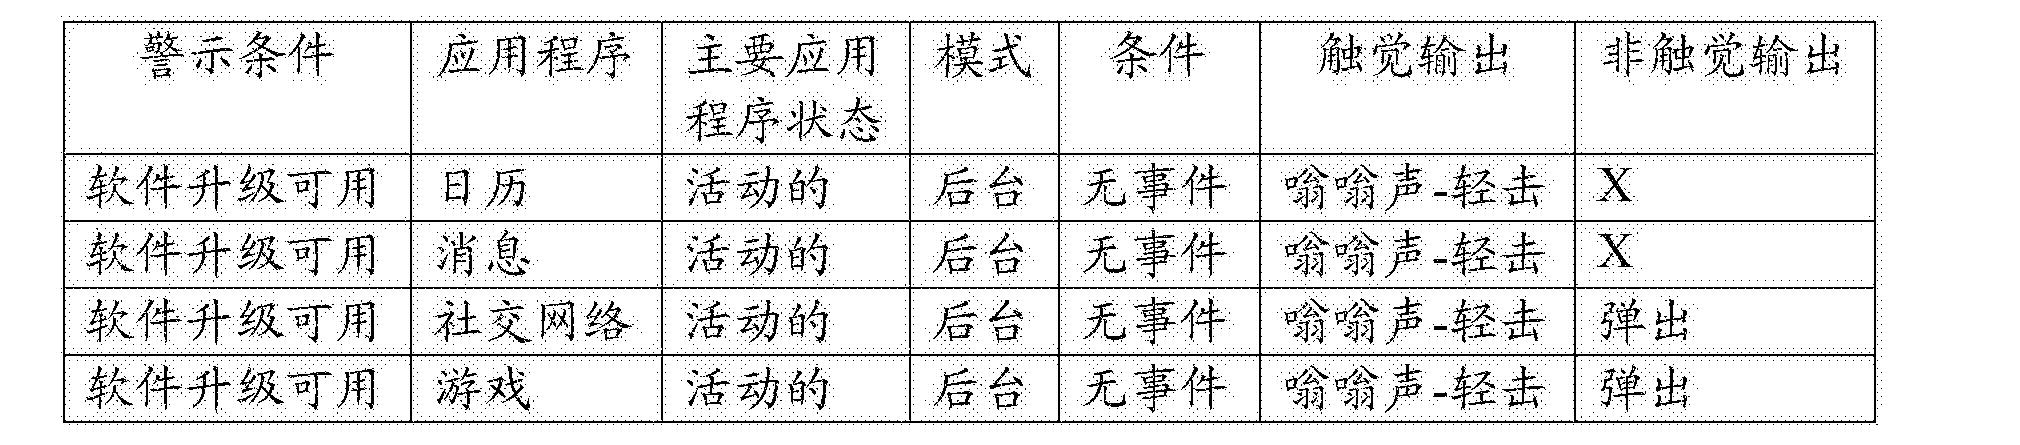 Figure CN106575230AD00751